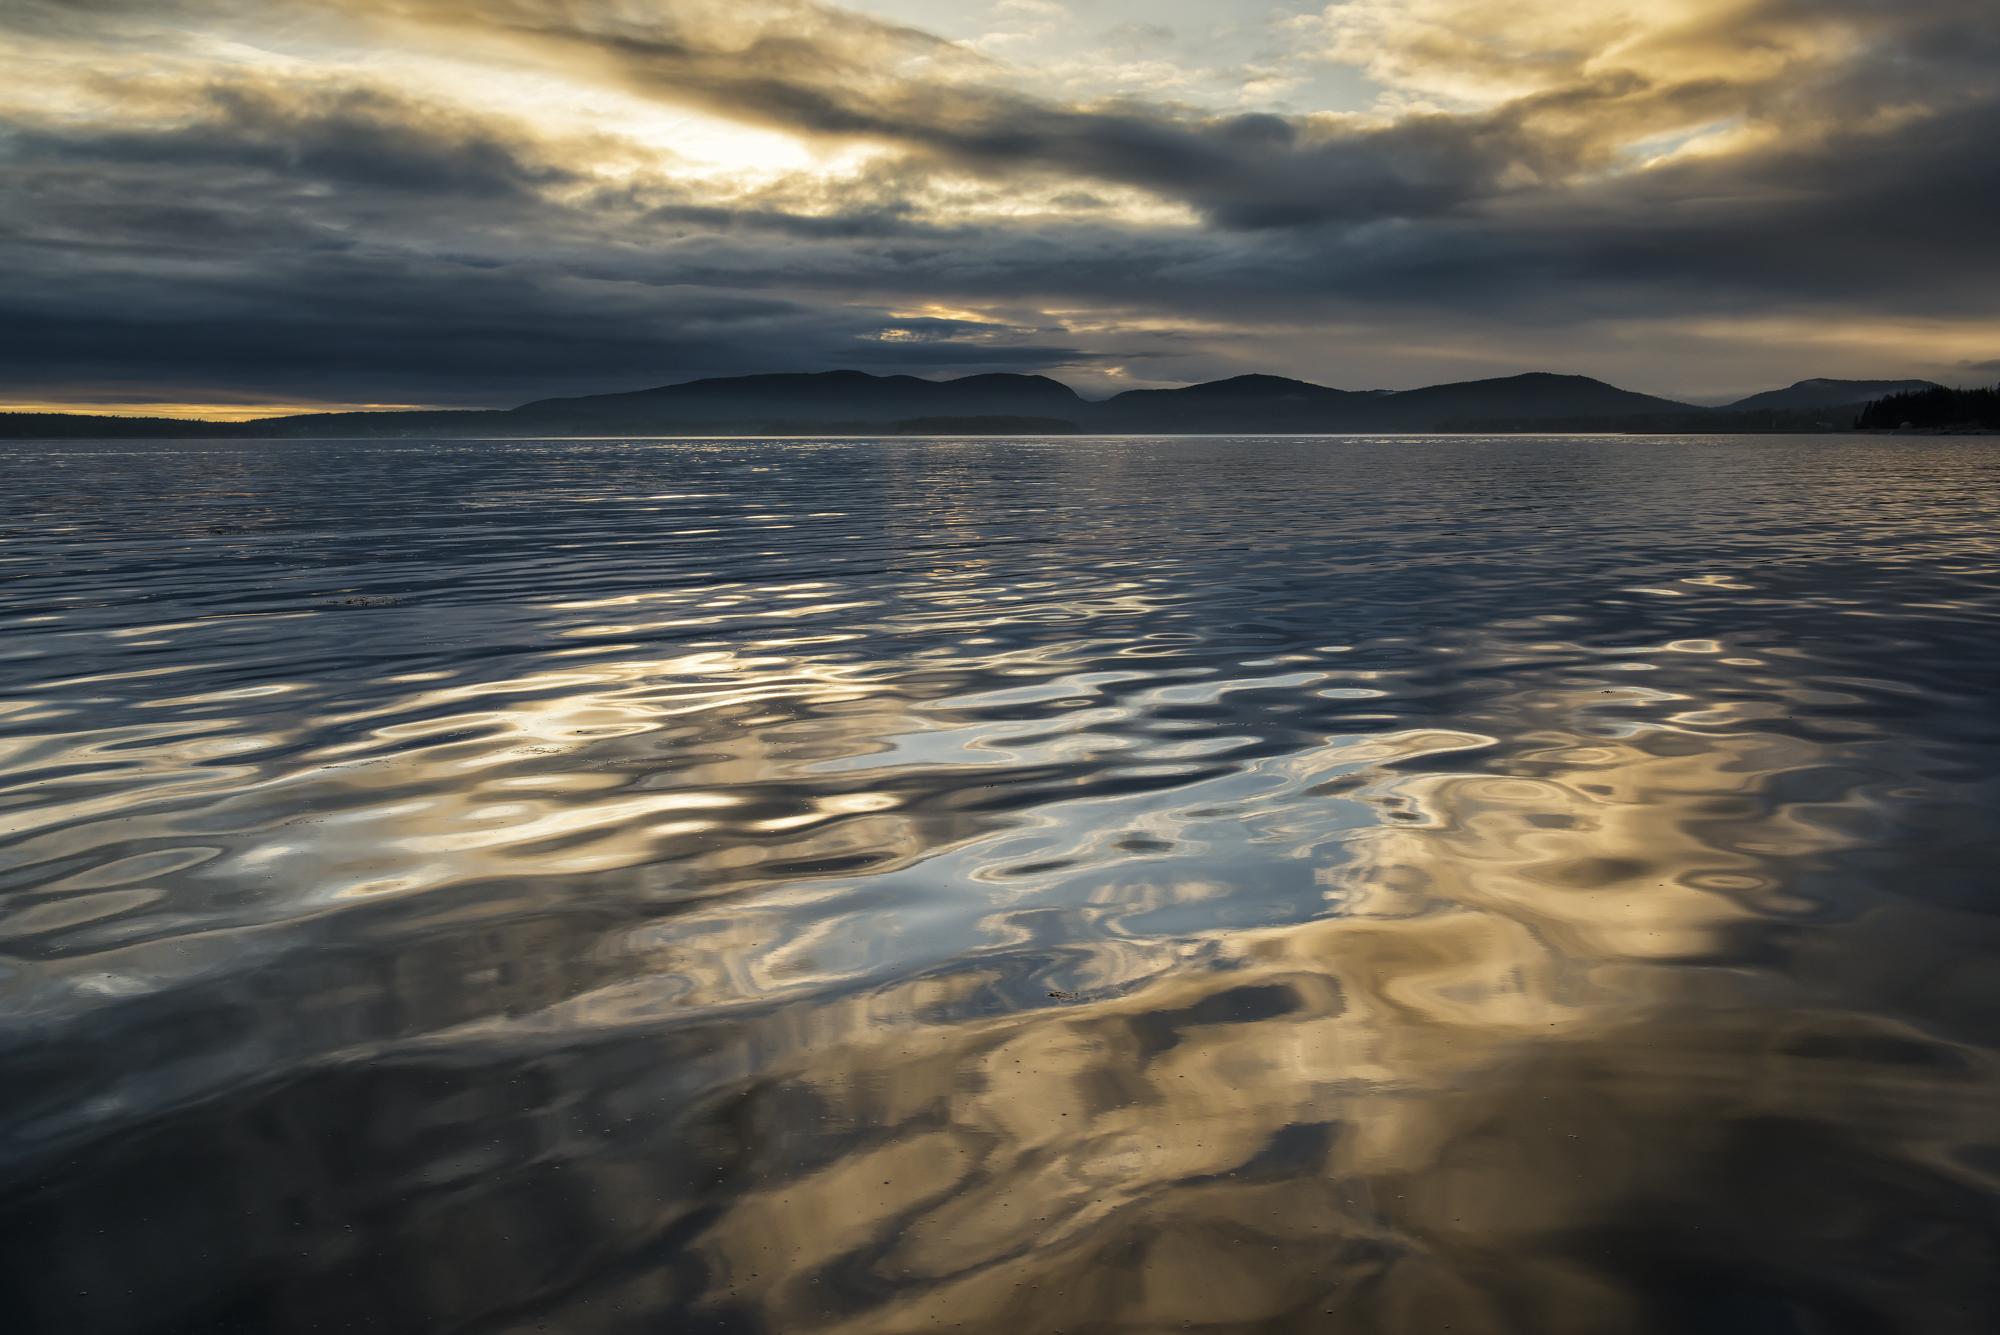 Skypool sunset, Mount Desert Island, Maine